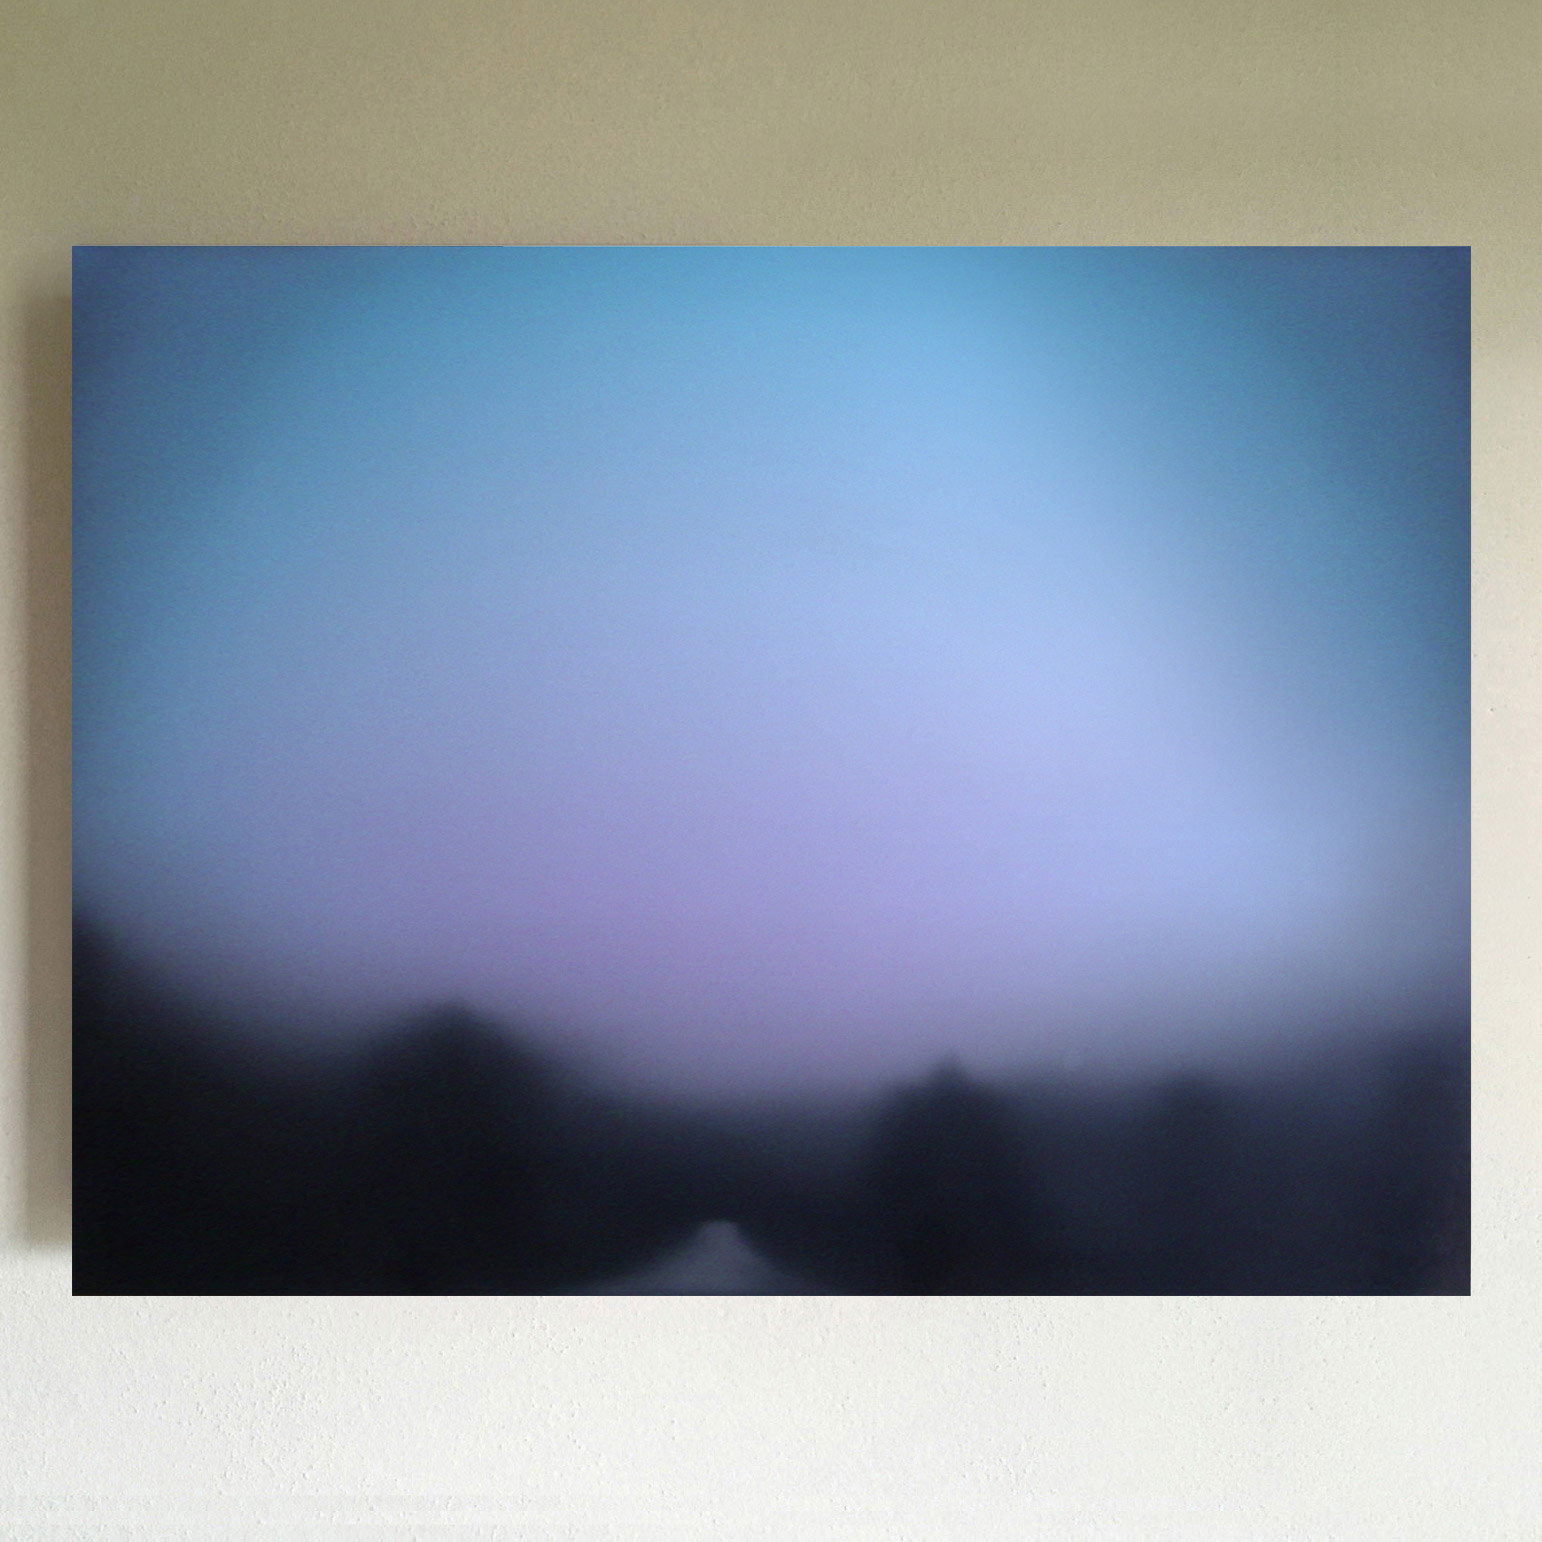 T#57-2010, oil on canvas, 90x120cm, priv. coll.